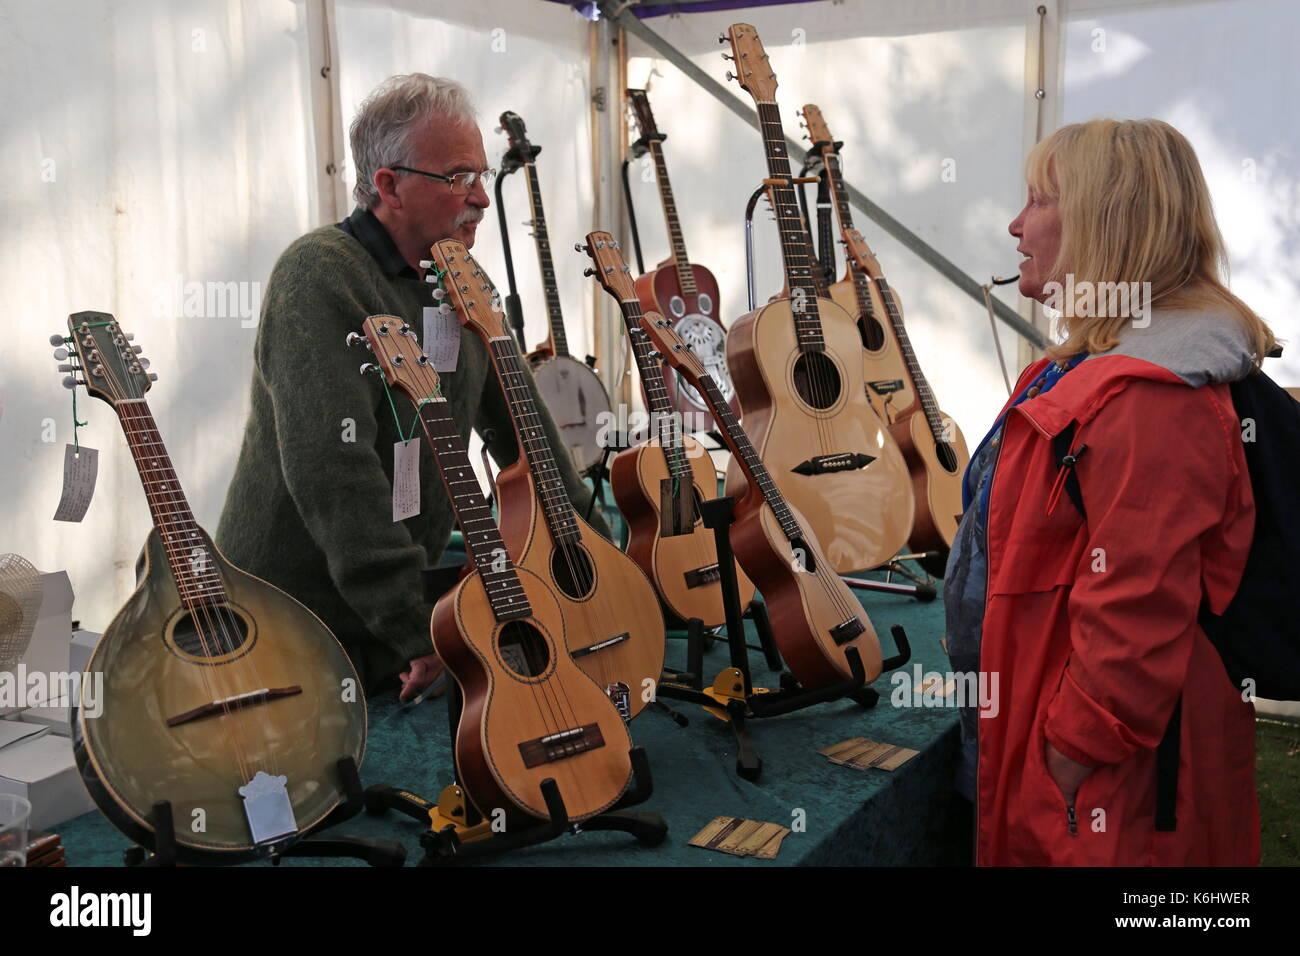 Robin Greenwood Instrumente, Sandkasten Feld, Swanage Folk Festival 2017, Isle of Purbeck, Dorset, England, Großbritannien, Stockbild